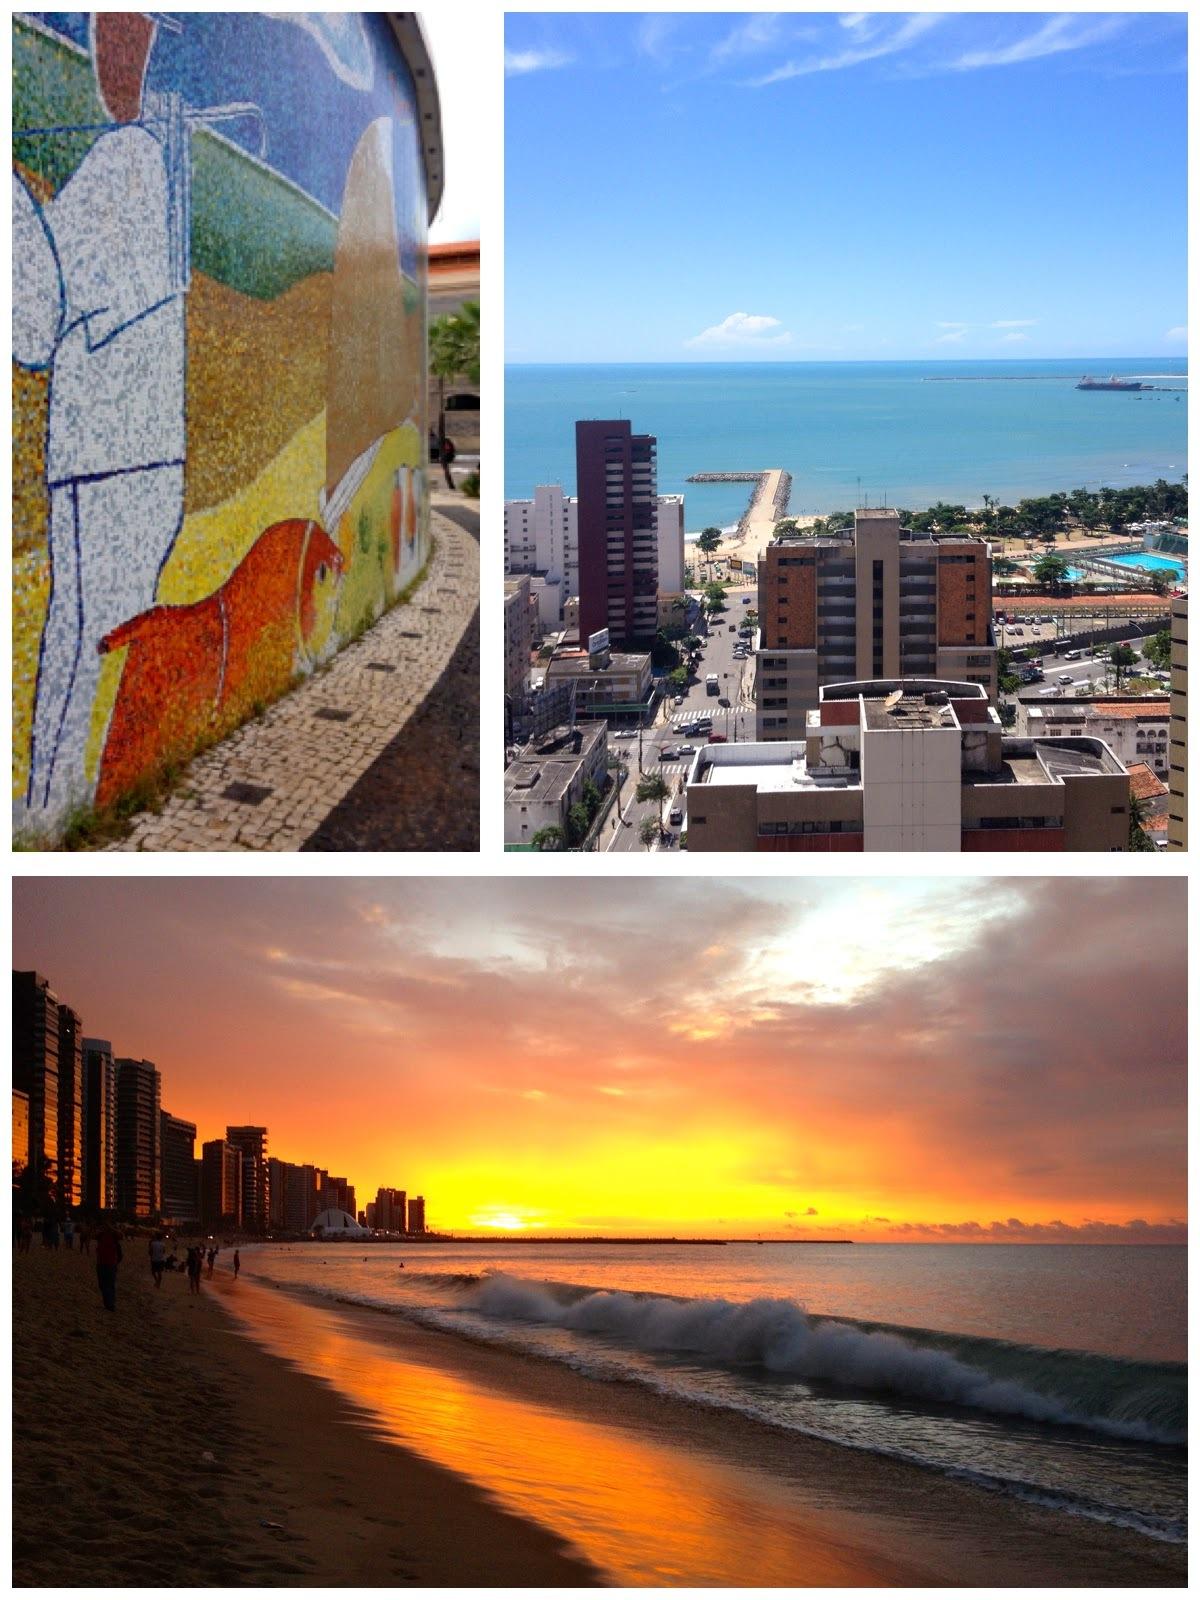 De viaje por Brasil - Parte I: Fortaleza